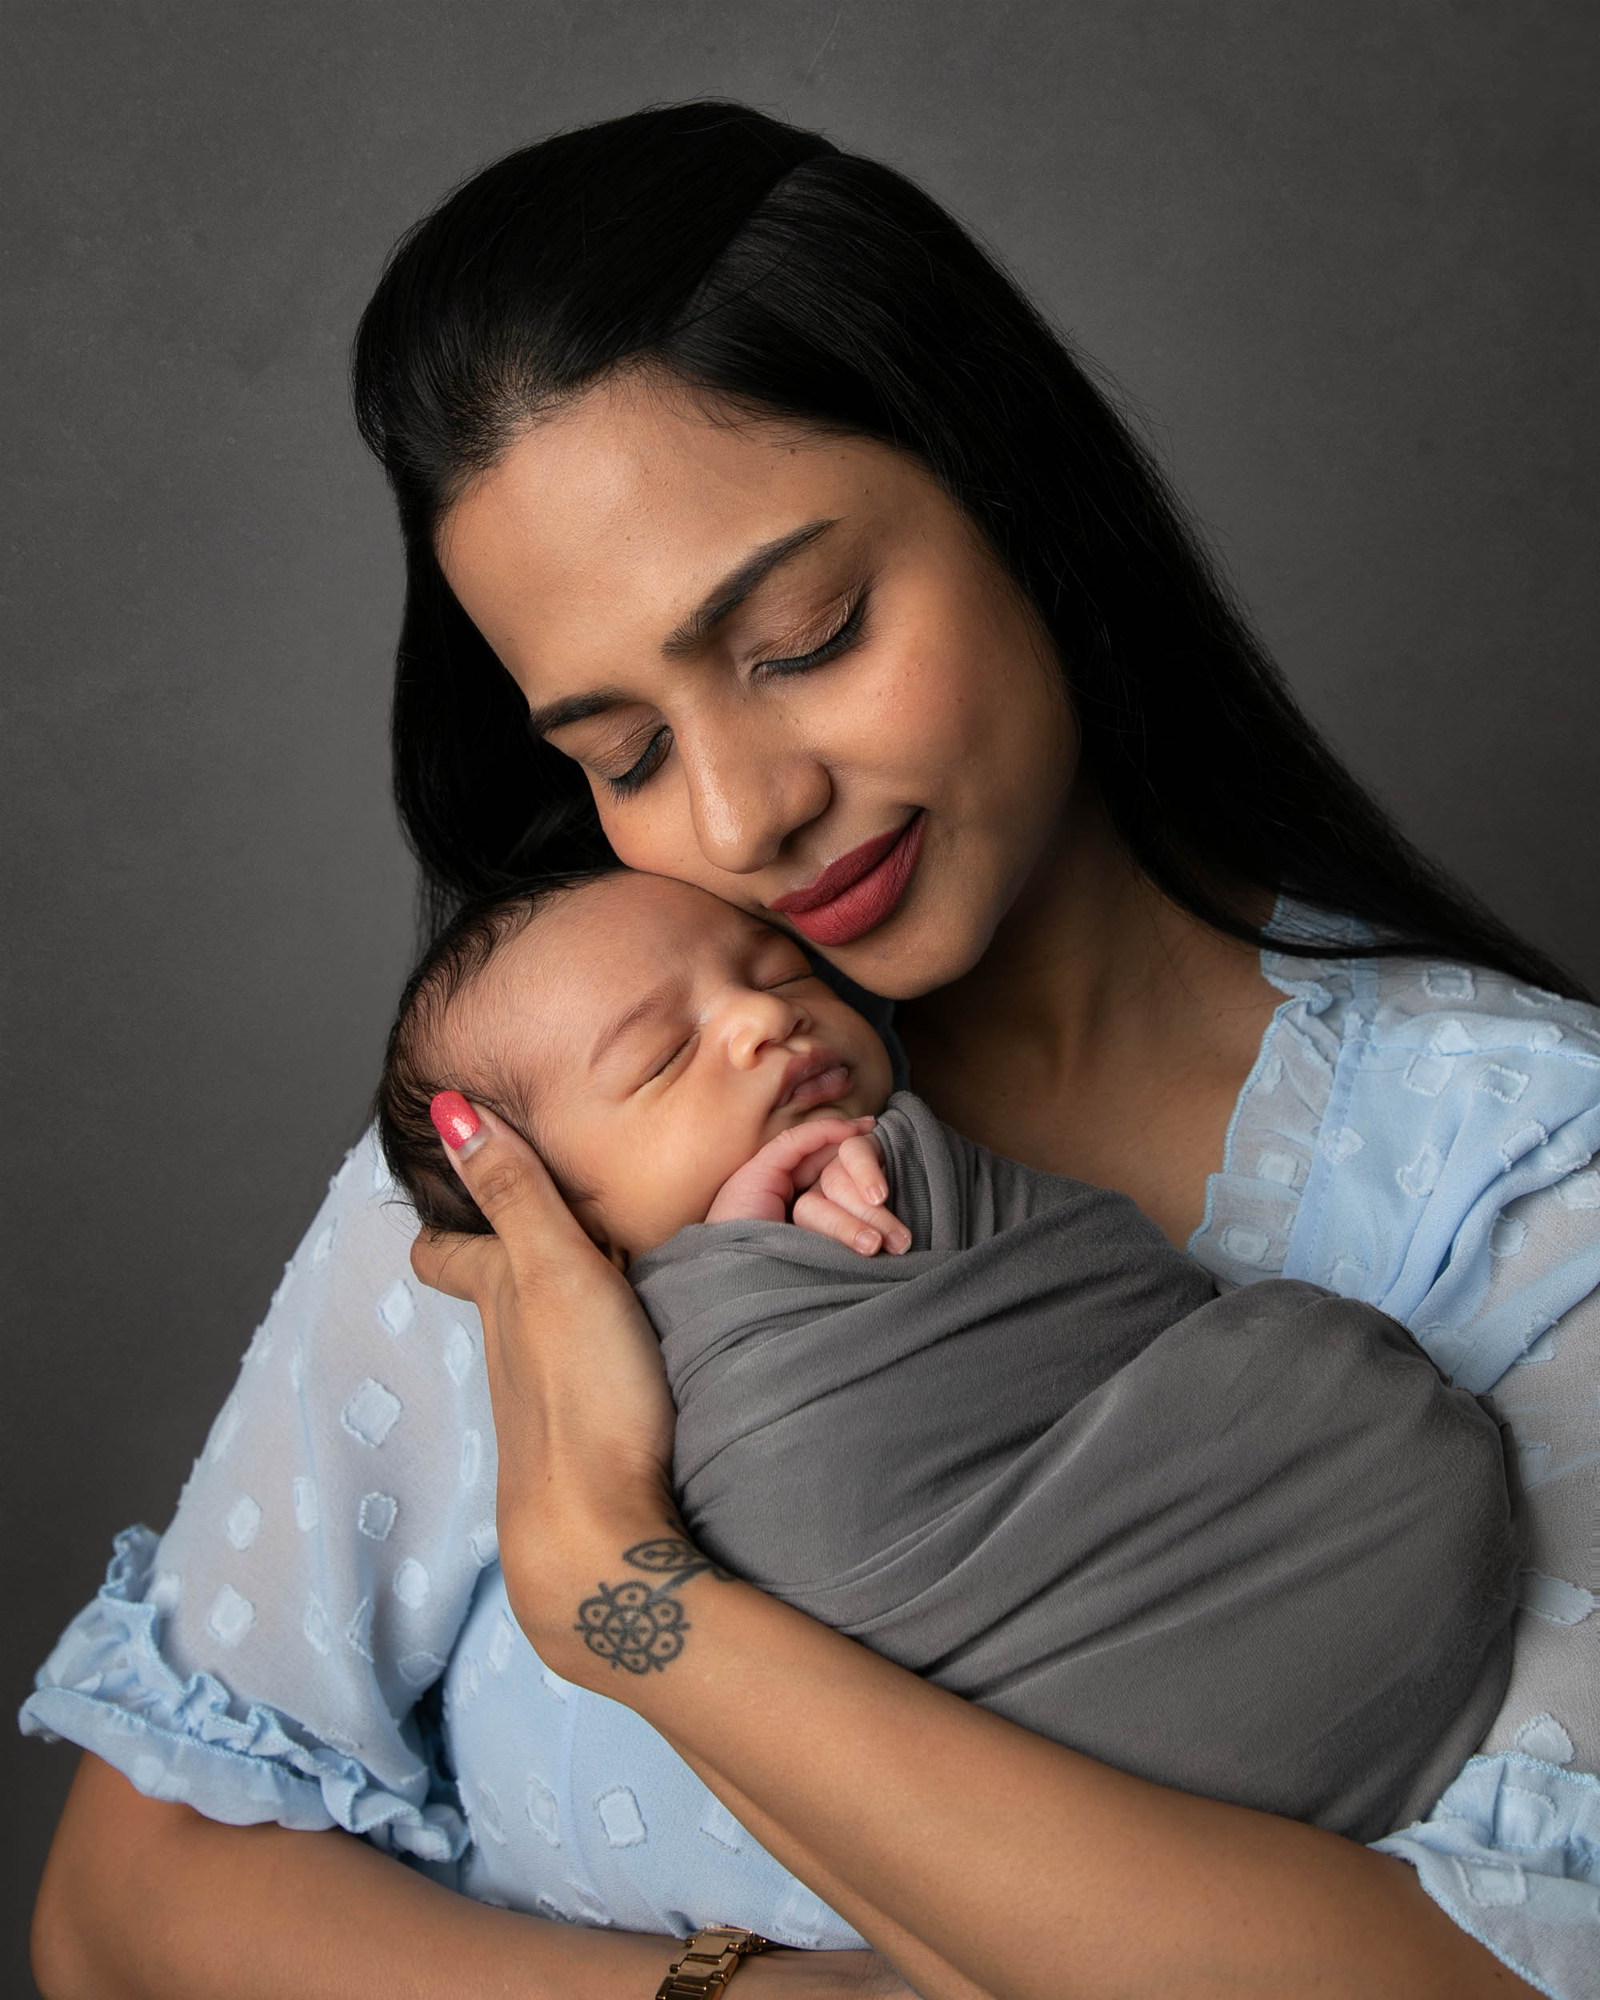 Mum holding newborn baby close with her eyes closed by haywards heath photographer